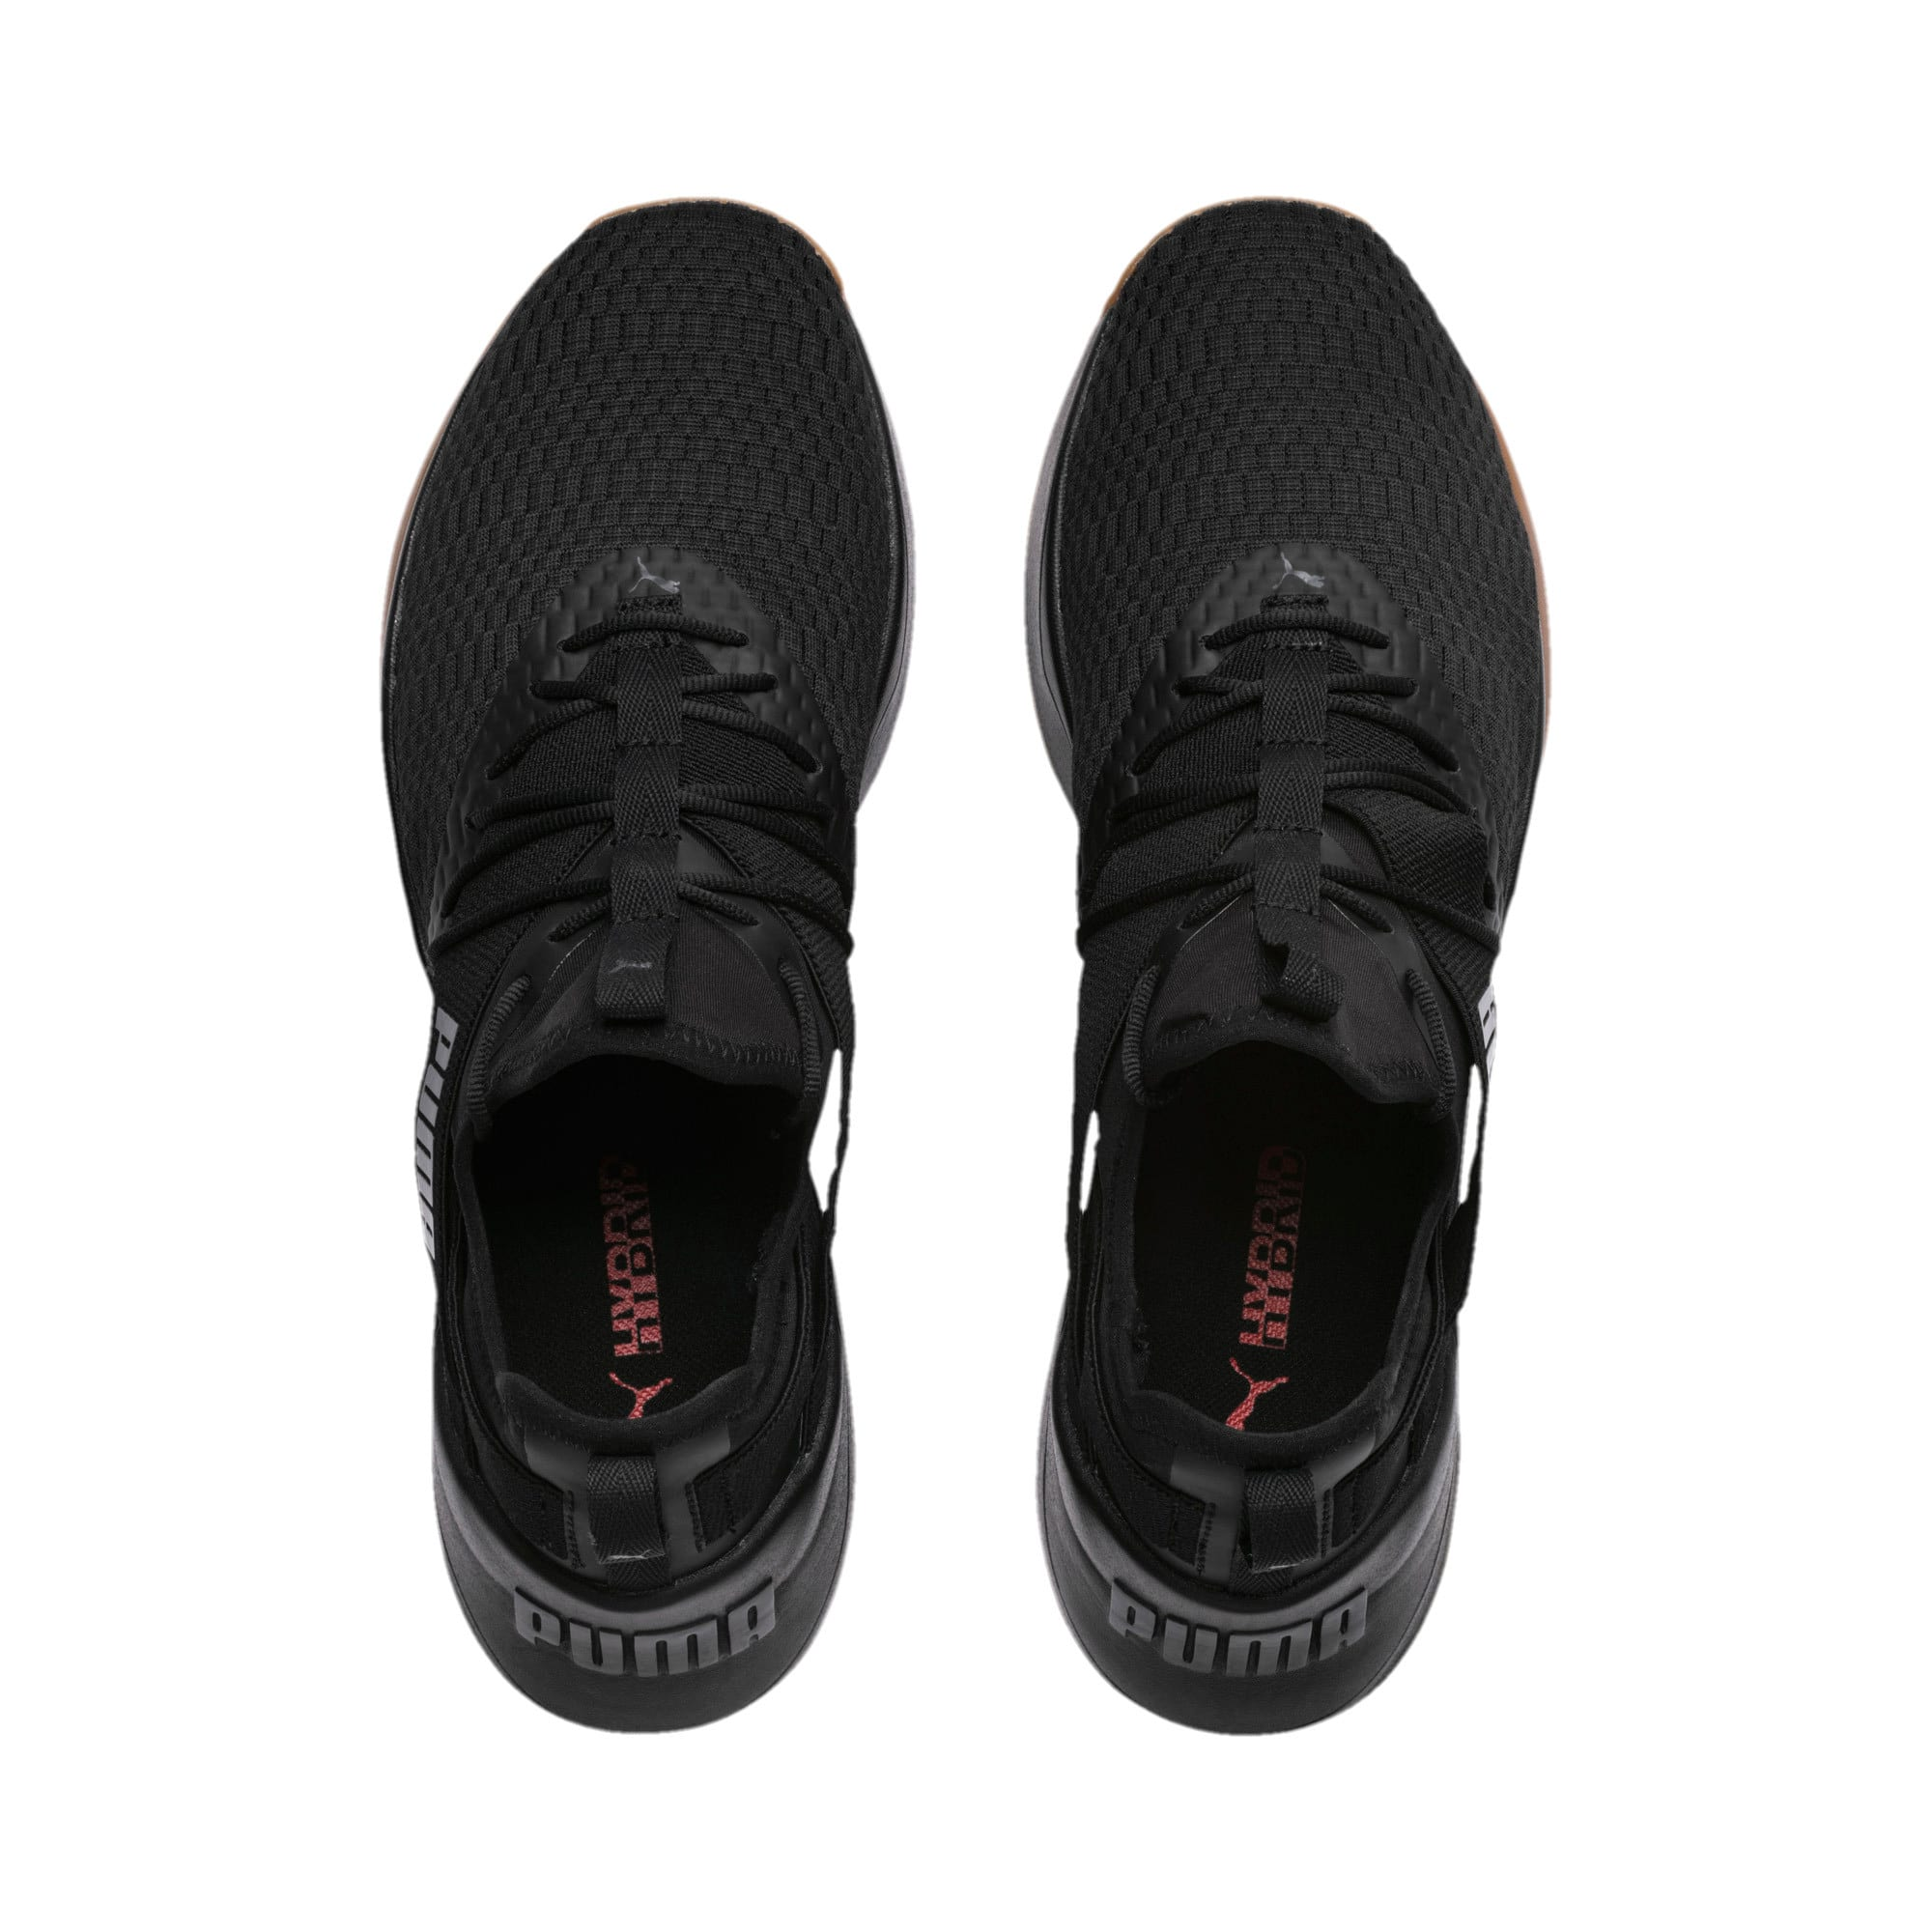 Thumbnail 6 of Jaab XT Summer Men's Training Shoes, Puma Black-Asphalt, medium